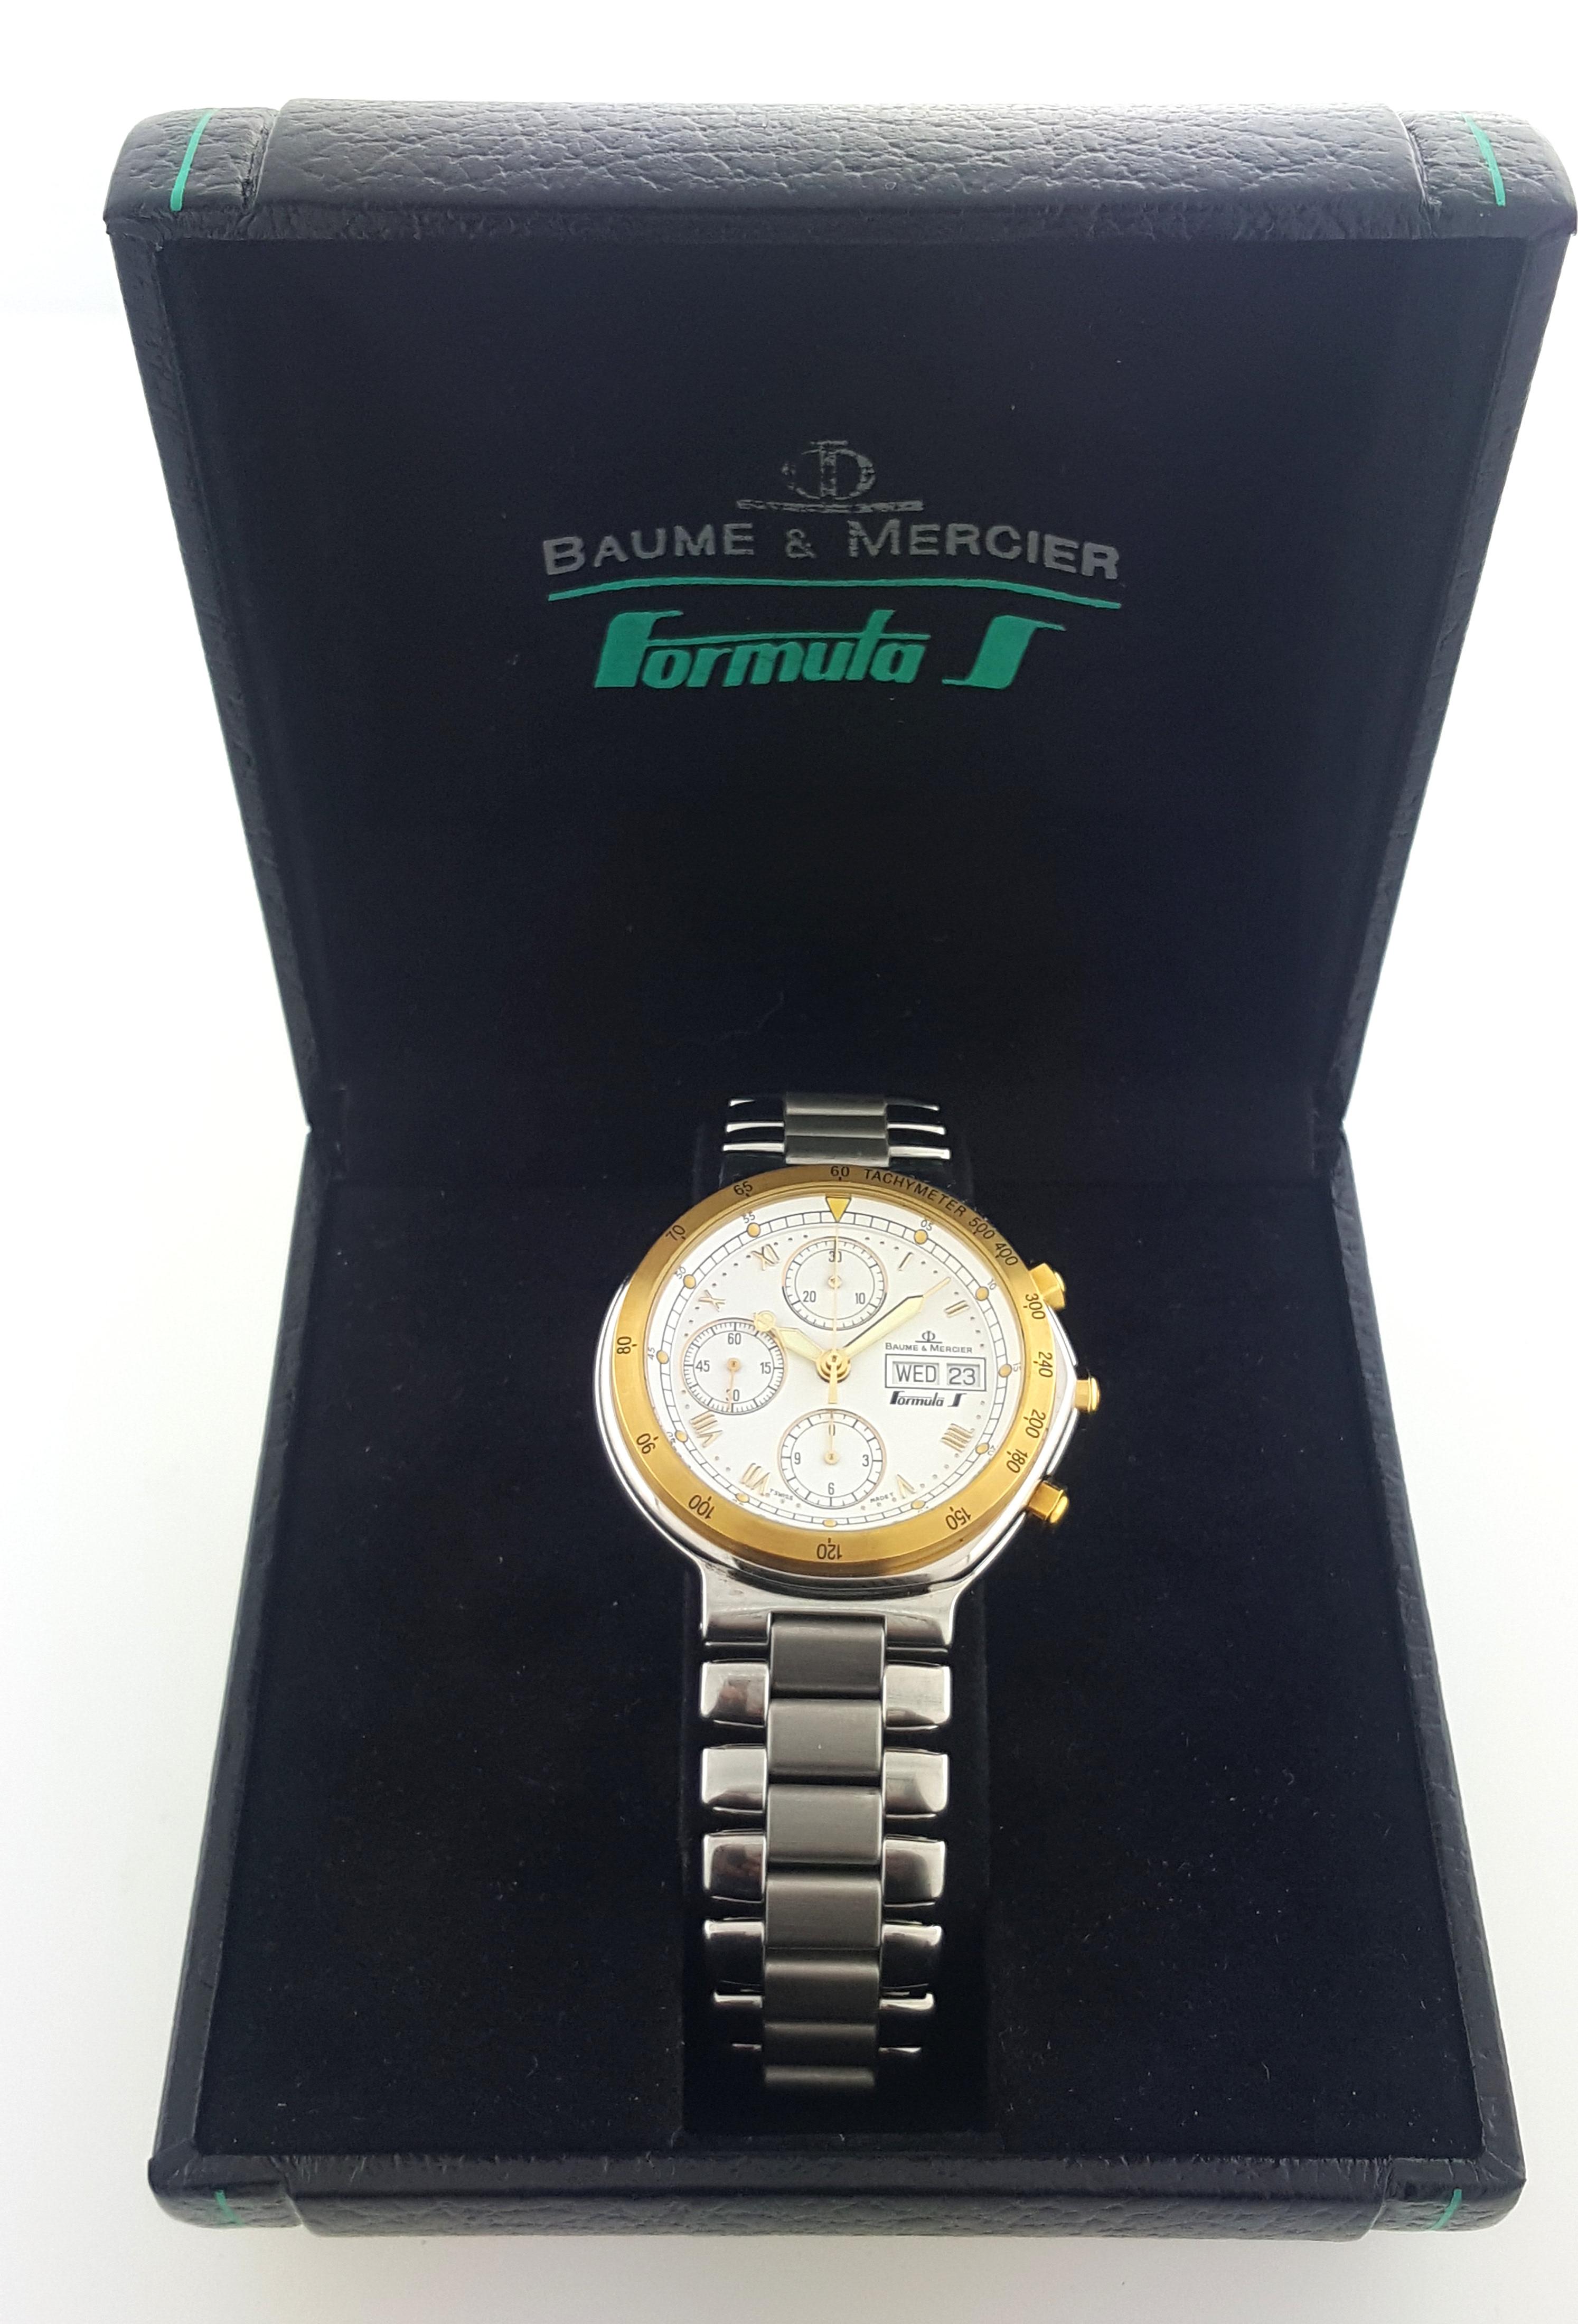 mint mens baume mercier formula s watch chronograph auto steel 18k gold orig bo ebay. Black Bedroom Furniture Sets. Home Design Ideas